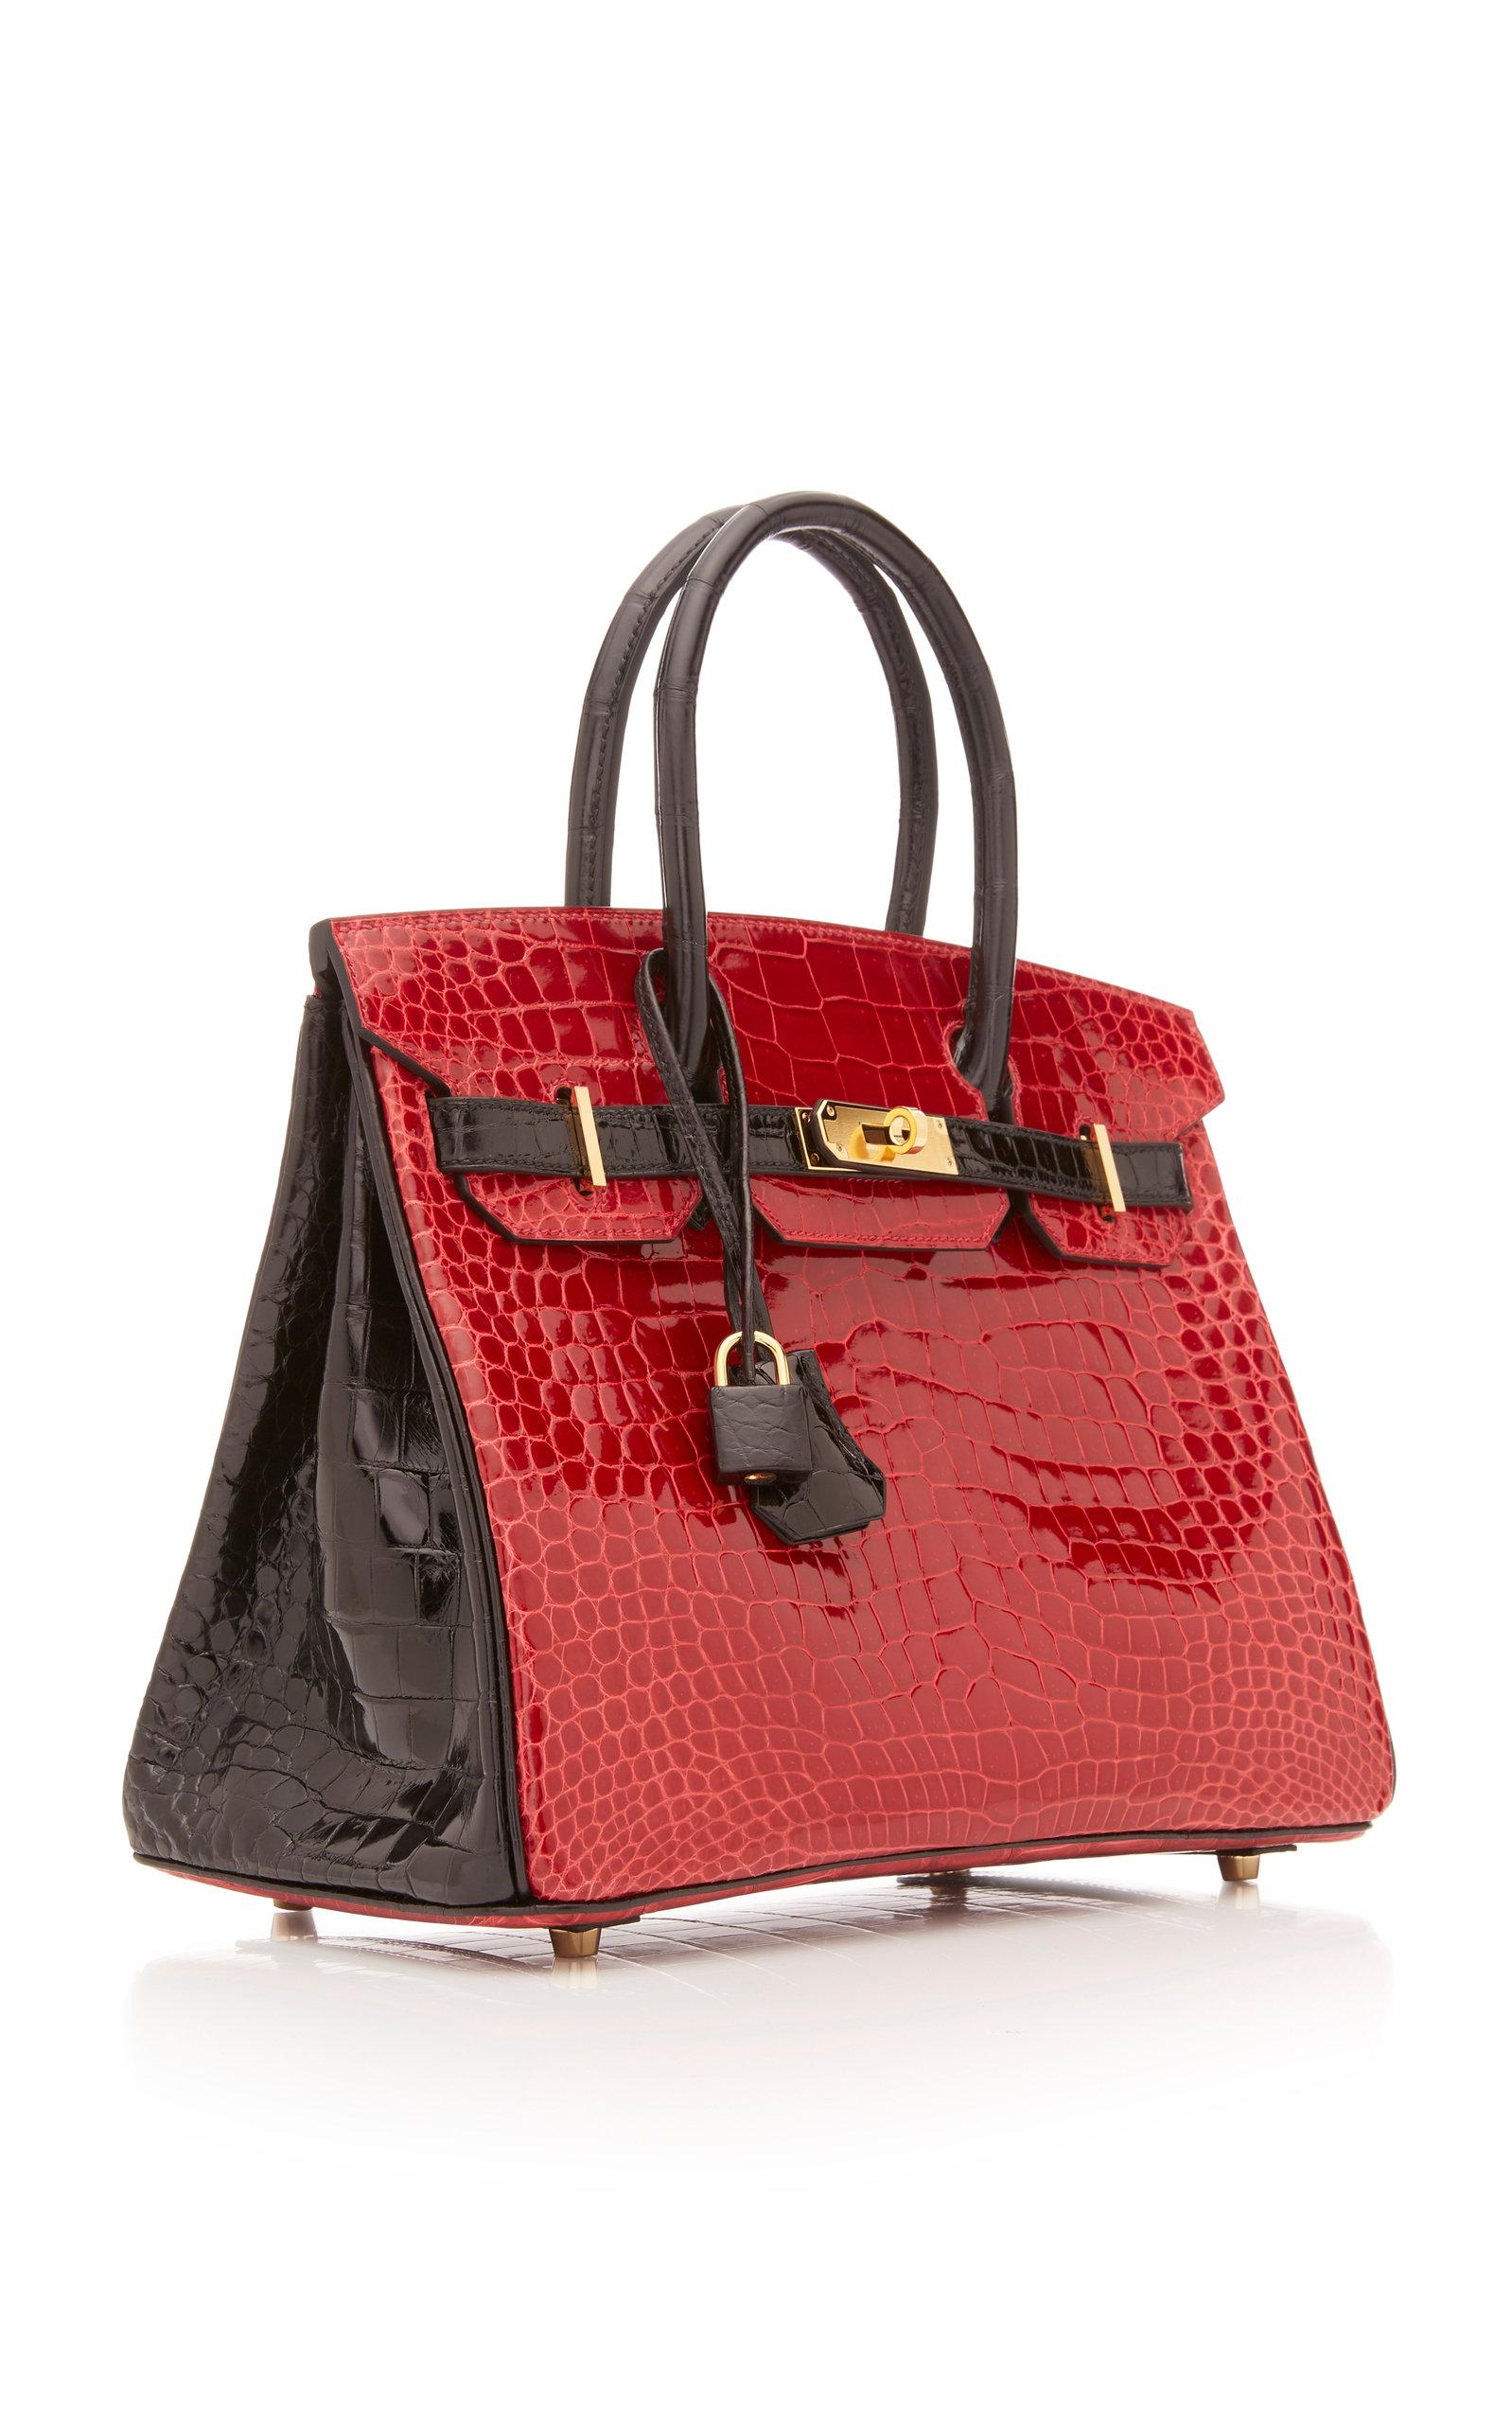 ceaf6a27536 Hermès Vintage by Heritage AuctionsHermes 30cm Shiny Briase and Black  Porosus Crocodile Special Order Horseshoe Birkin